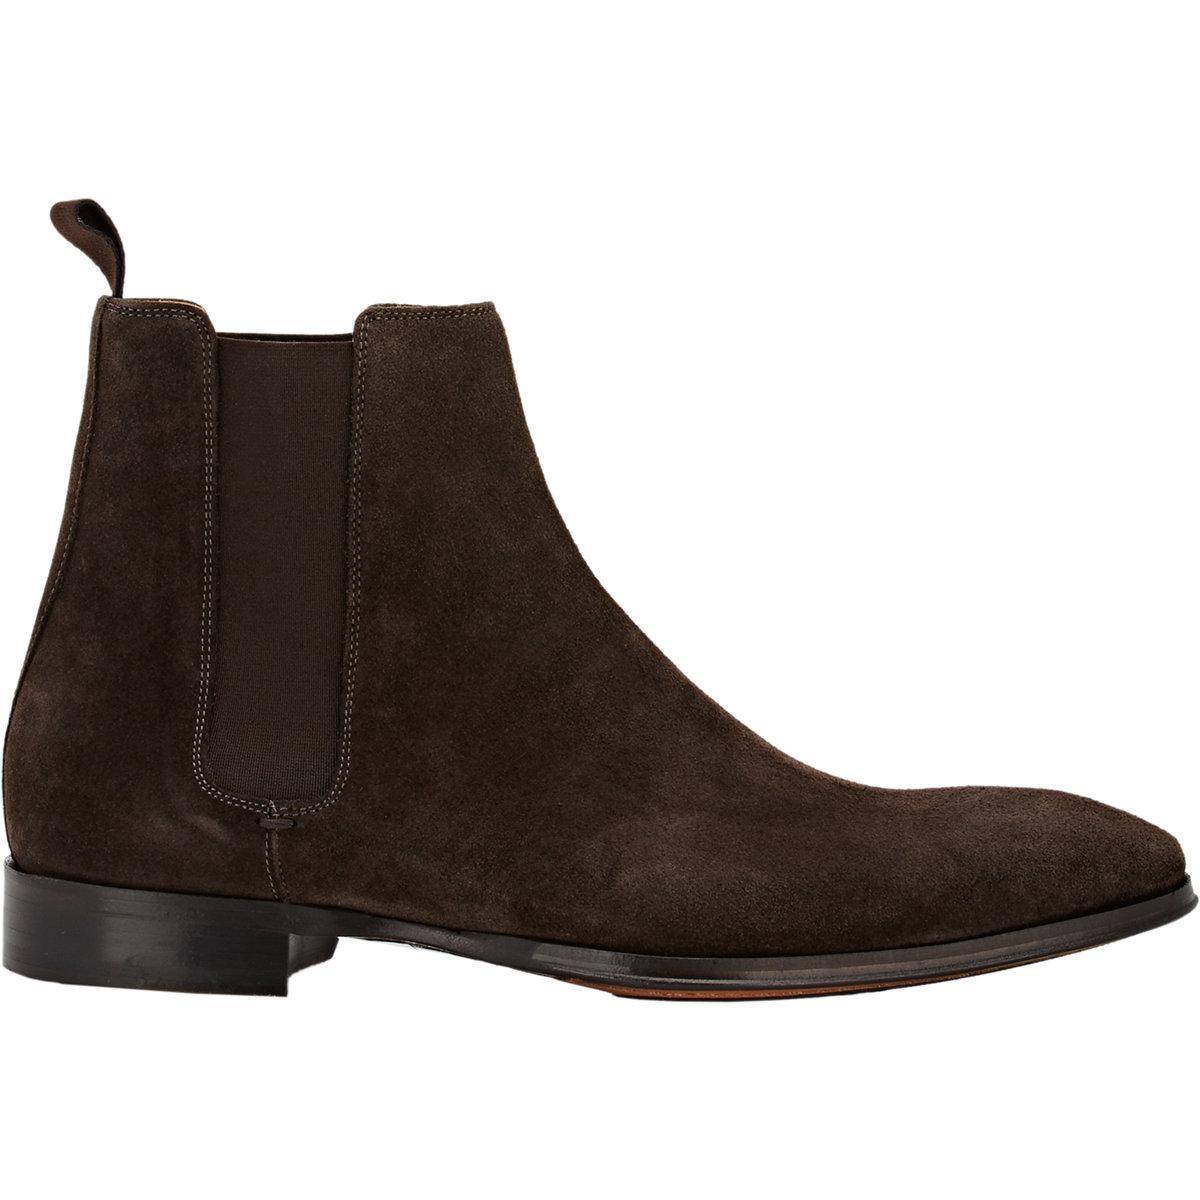 barneys new york suede chelsea boots in brown for men lyst. Black Bedroom Furniture Sets. Home Design Ideas